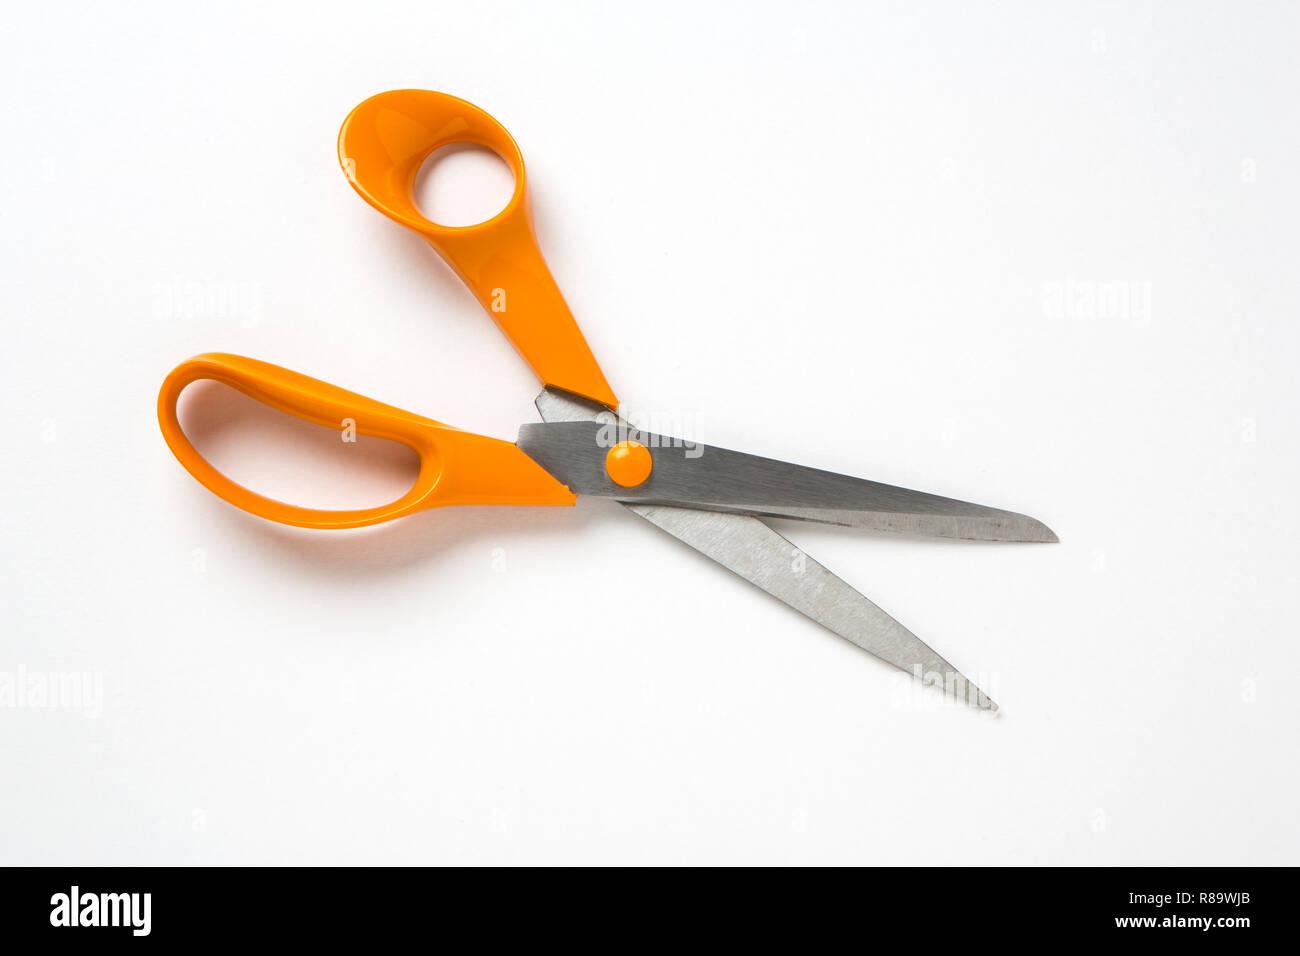 Orange handled kitchen scissors - Stock Image